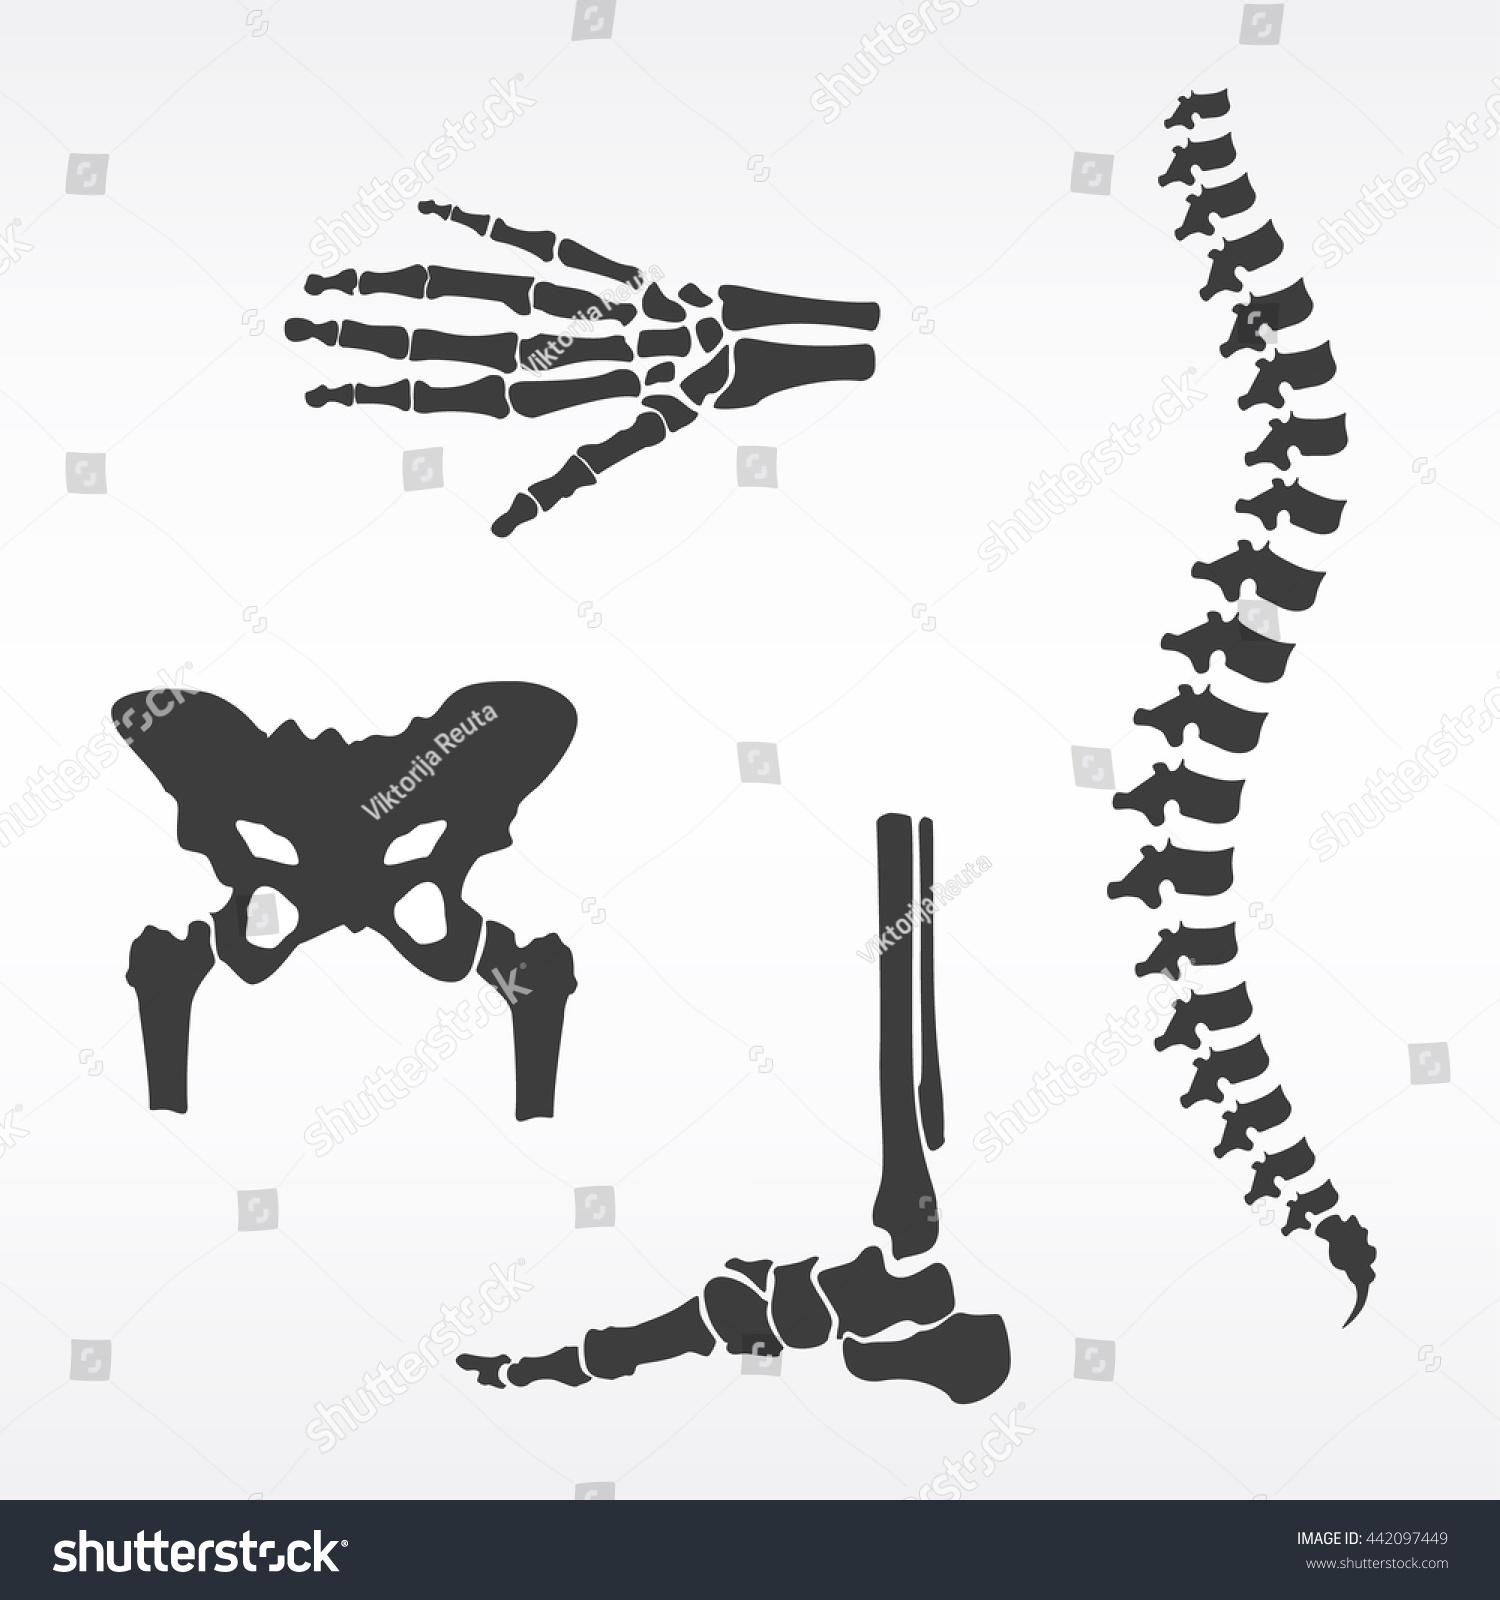 Vector Illustration Parts Human Skeleton Human Stock Photo (Photo ...